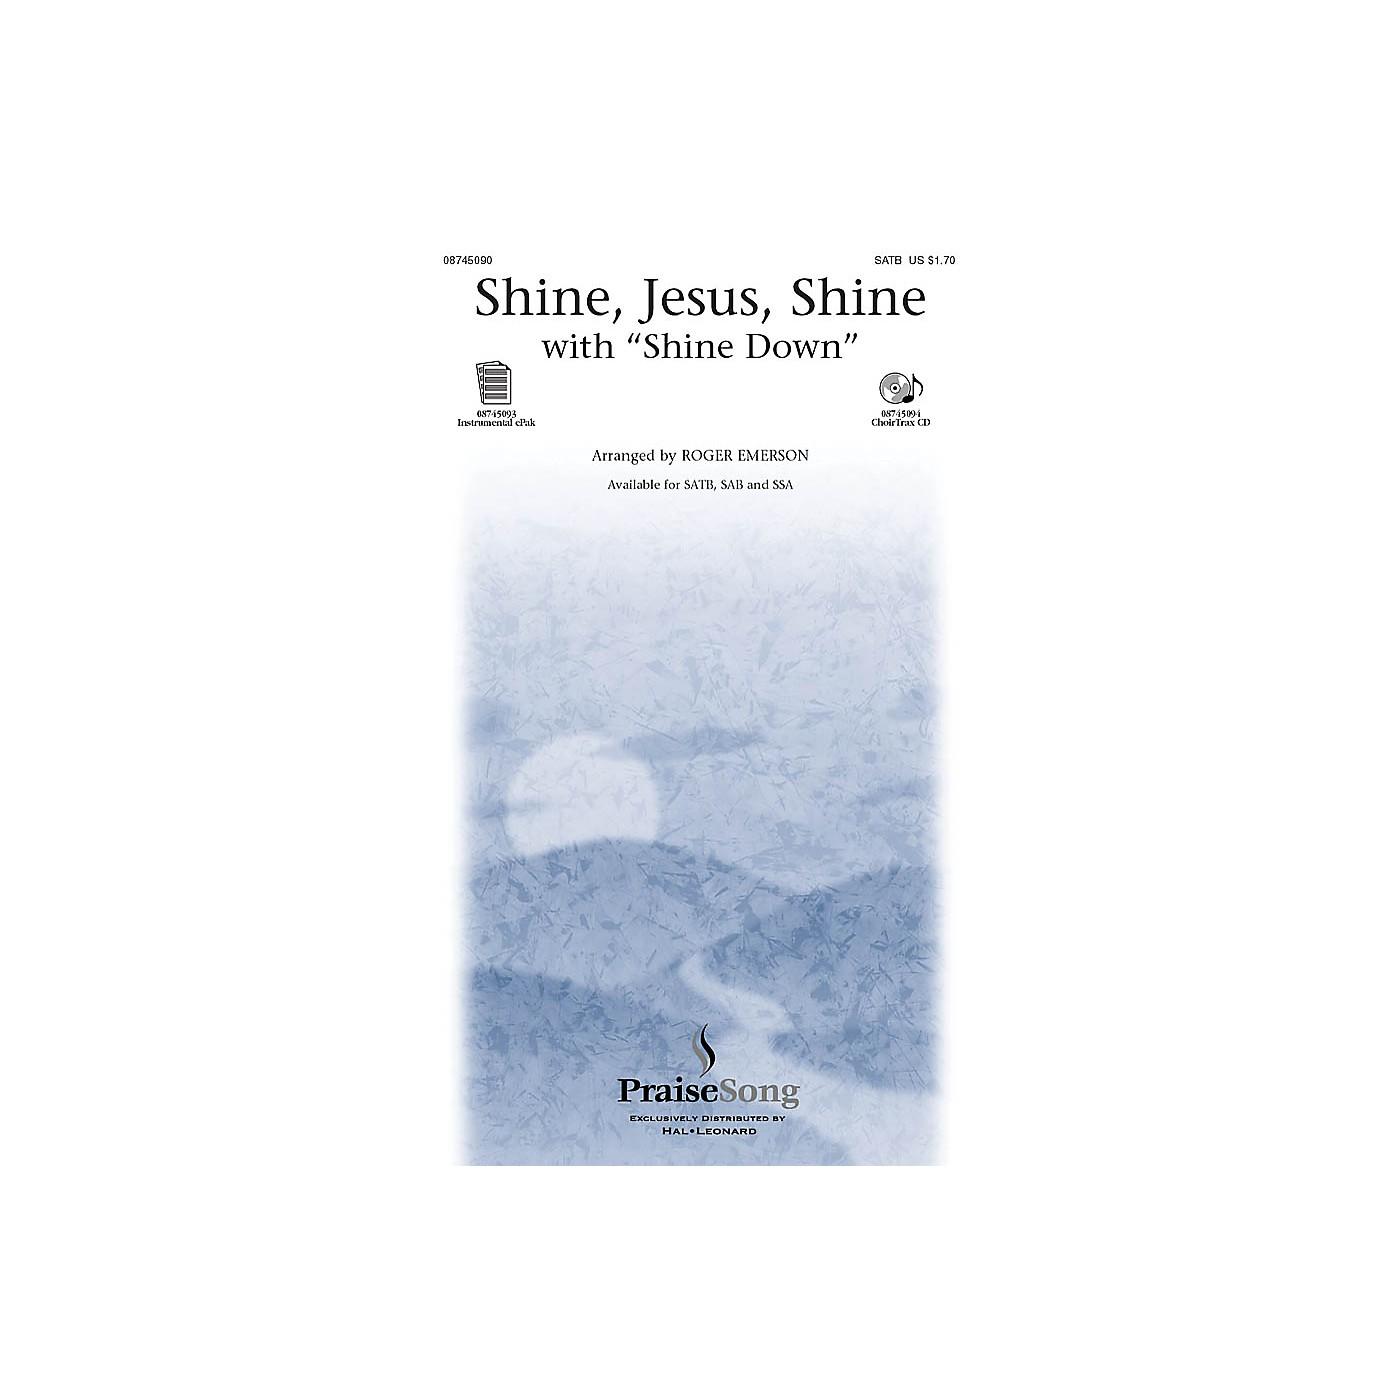 PraiseSong Shine Jesus Shine (with Shine Down) CHOIRTRAX CD Arranged by Roger Emerson thumbnail